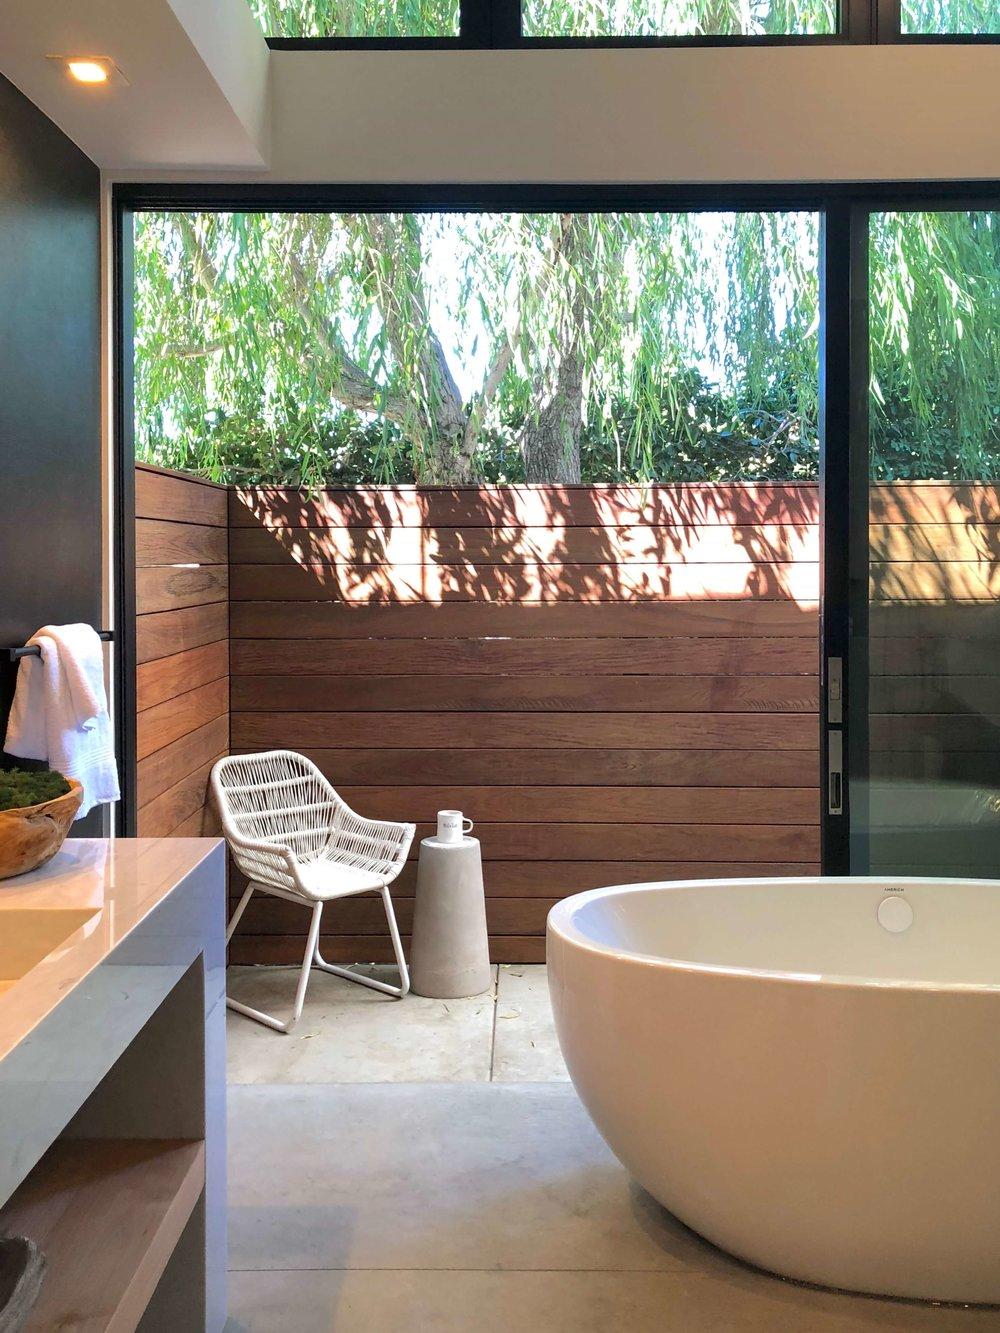 Master bathroom in California contemporary, Dwell on Design's Fall Home Tour, Designer: Vitus Matare #bathroomdesign #freestandingtub #bathroomideas